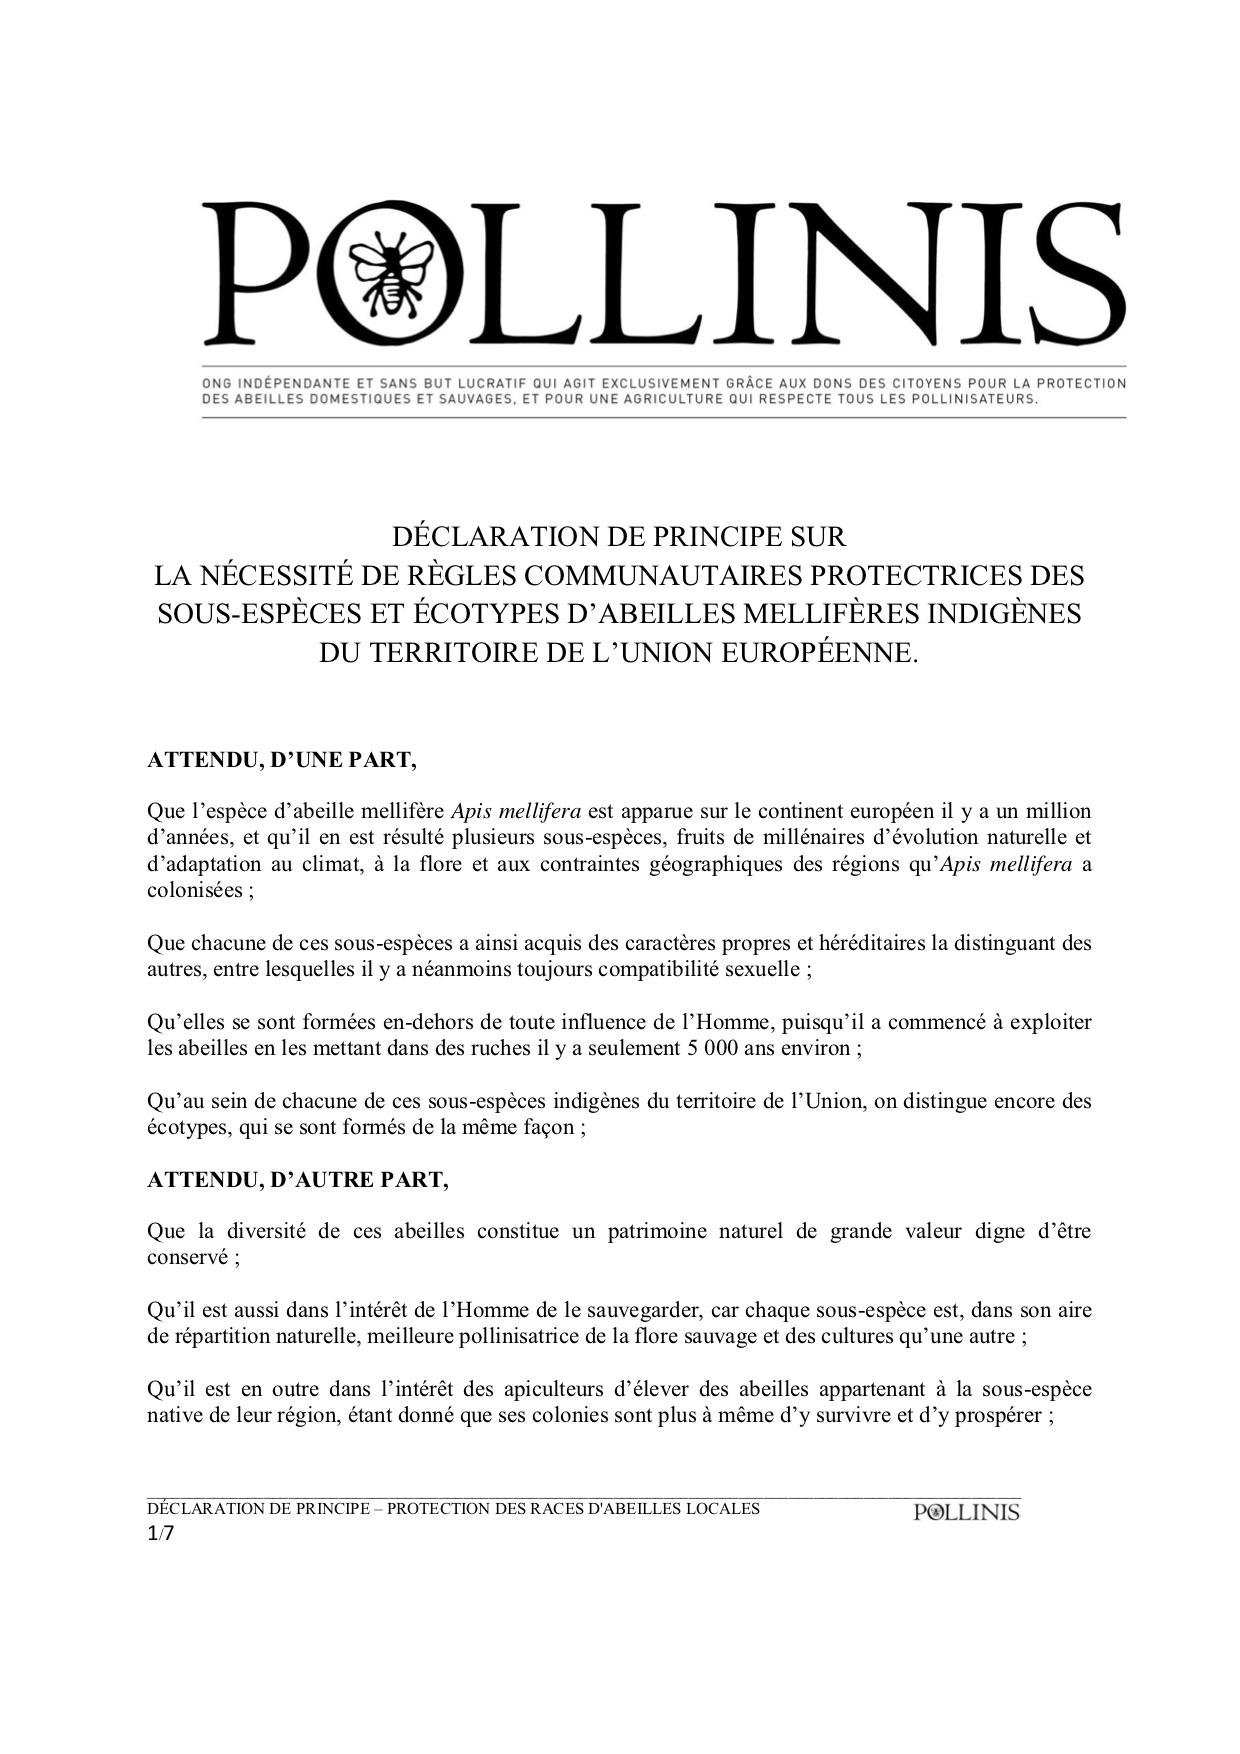 pollinis-declaration-de-principe-ue